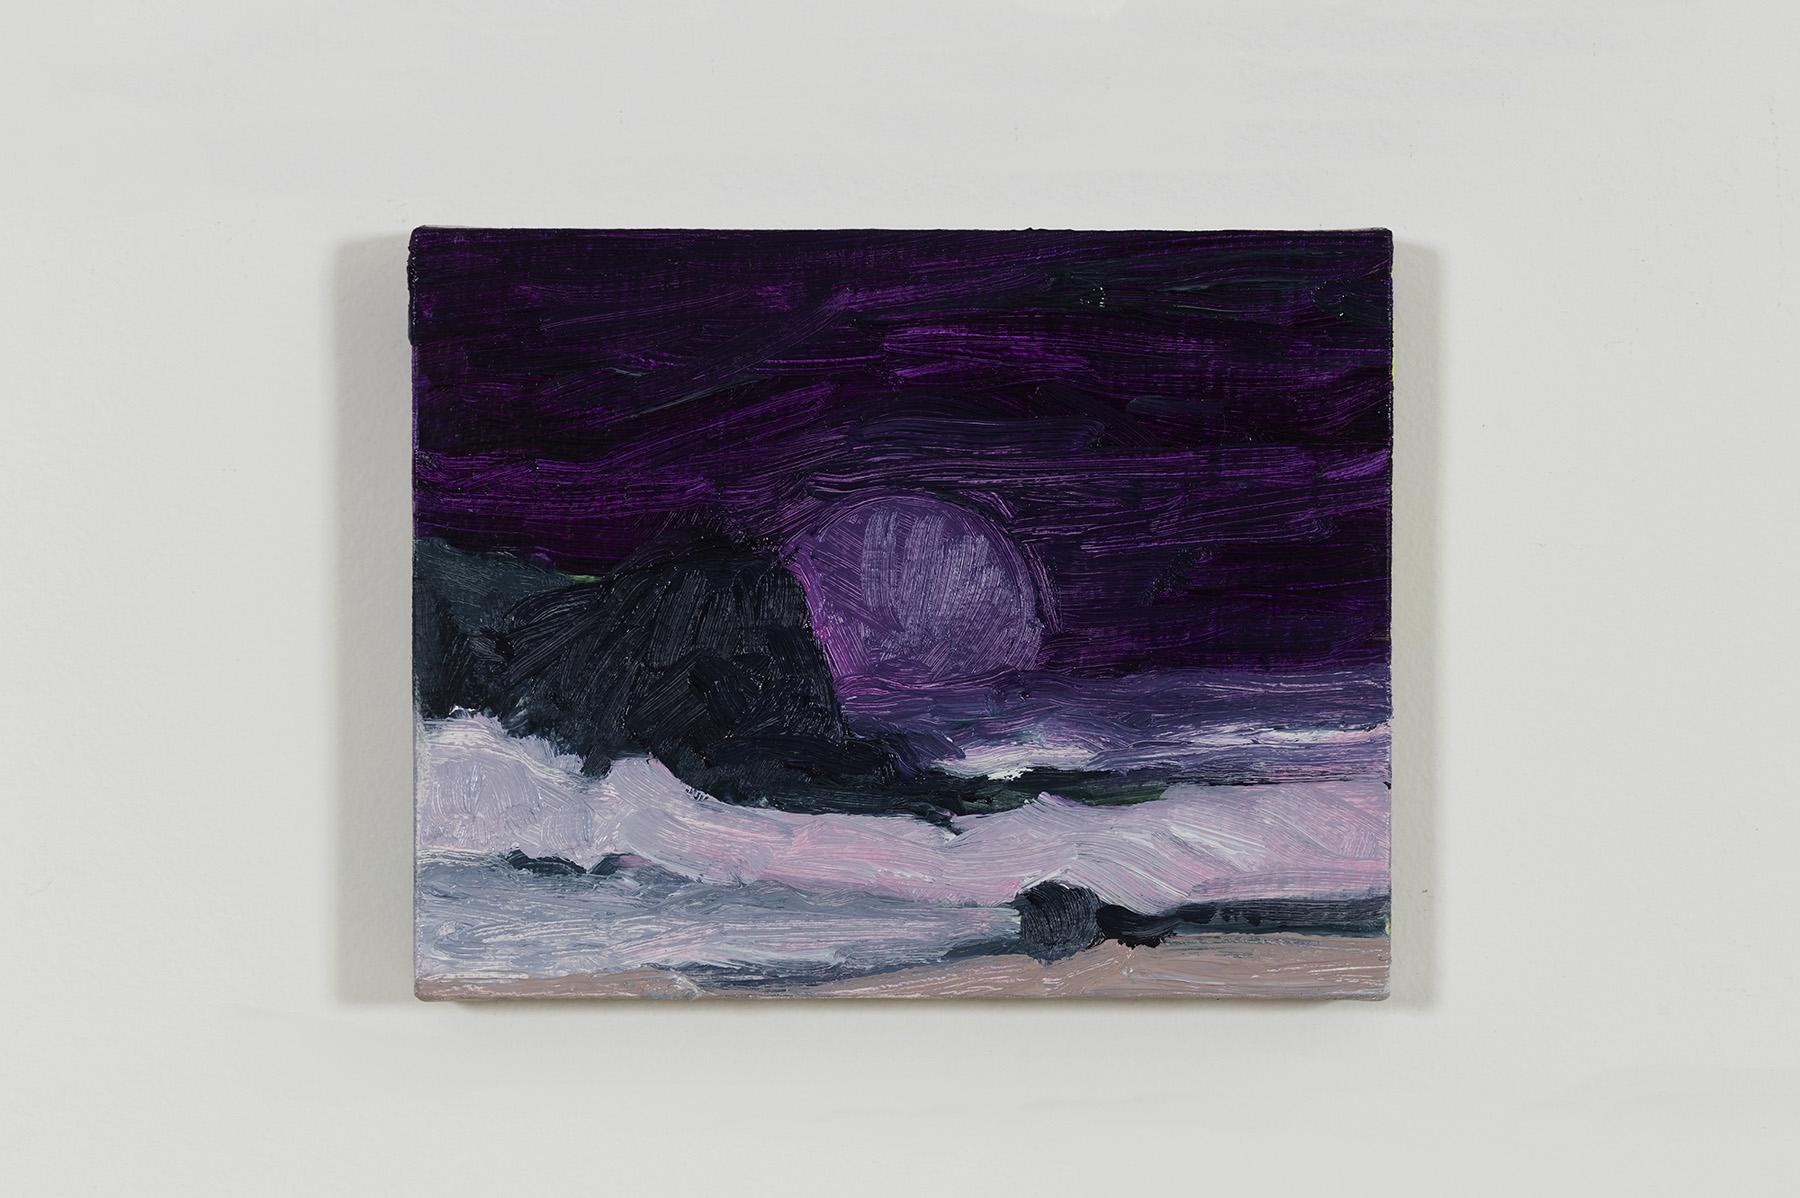 Gabriela Machado, Sem Título, 2017, óleo sobre tela, 15 x 20 cm